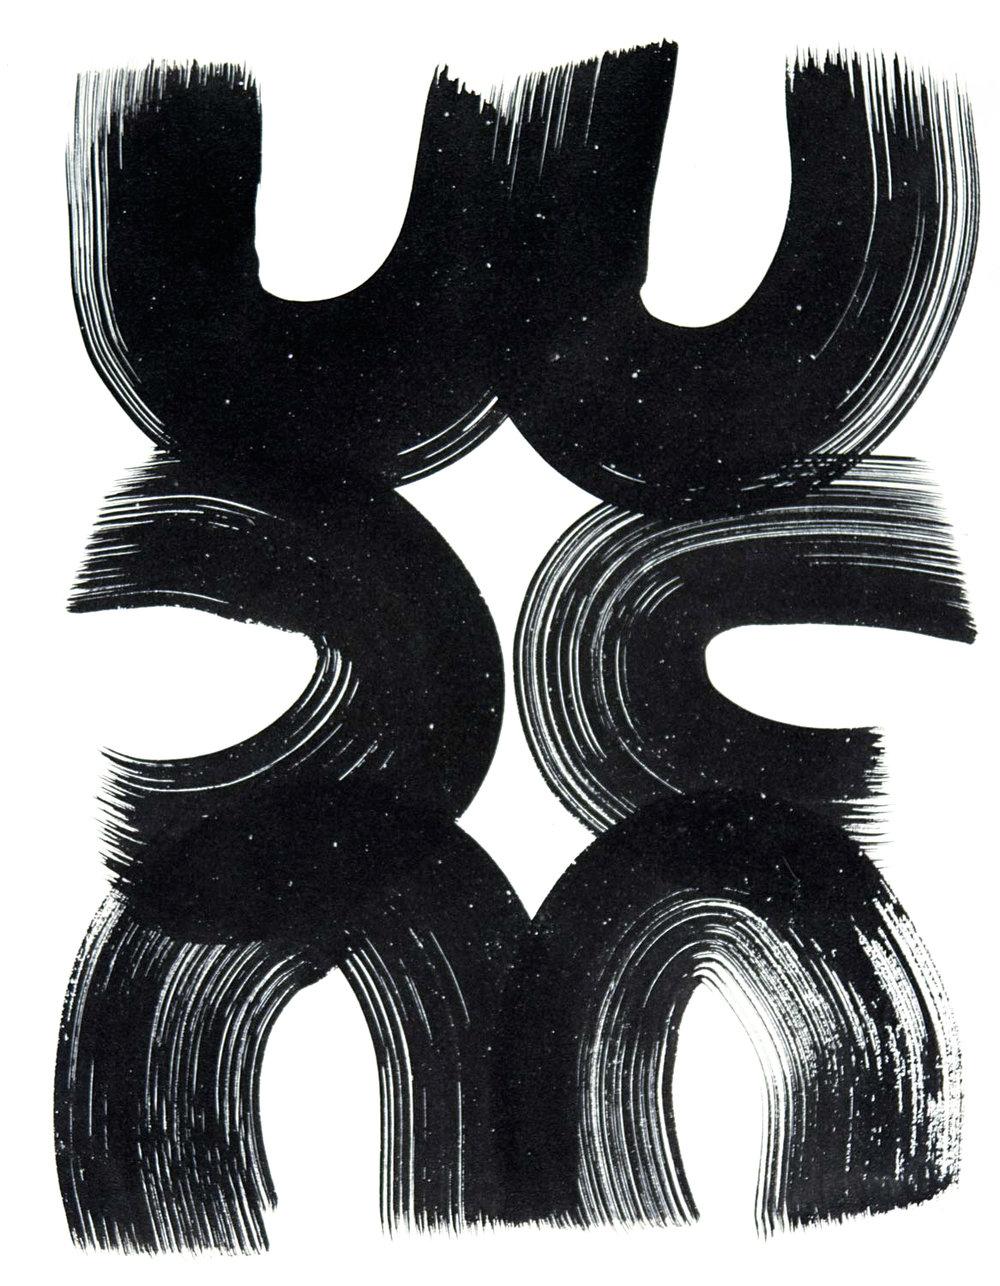 Vault 64 , 2016 Sumi ink on paper 14.6250 x 12.6250 in.